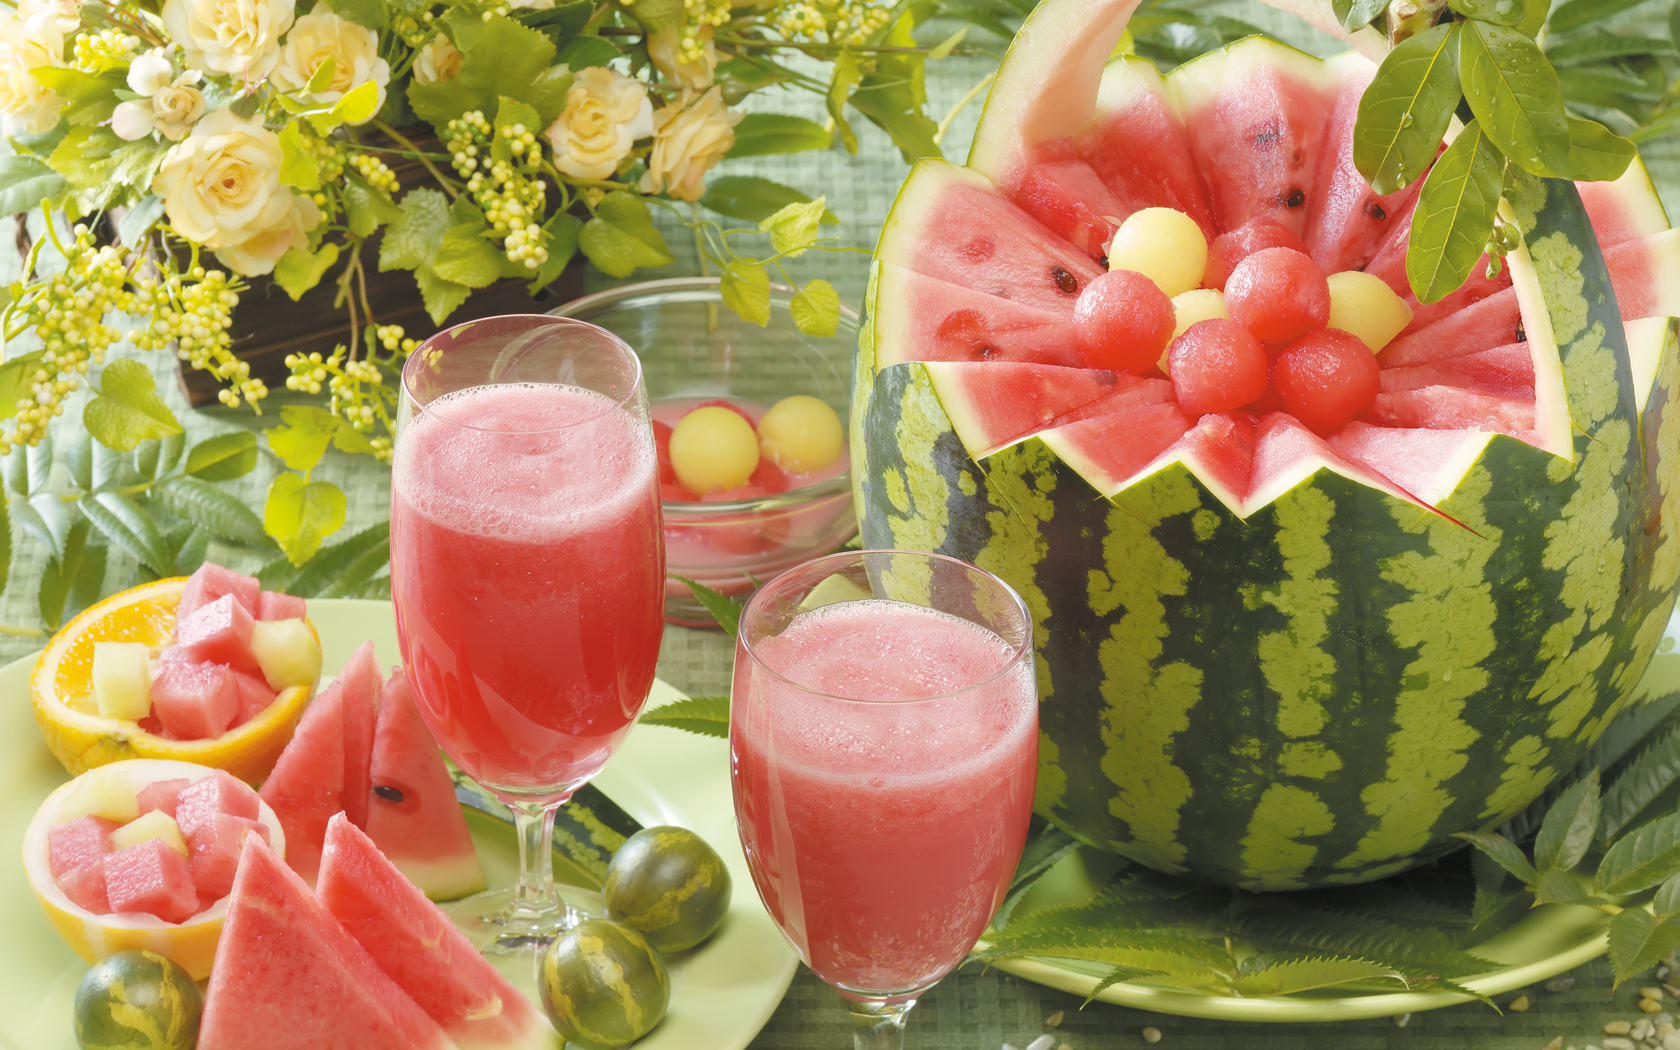 Juice Wallpaper 835691 1680x1050px 1680x1050